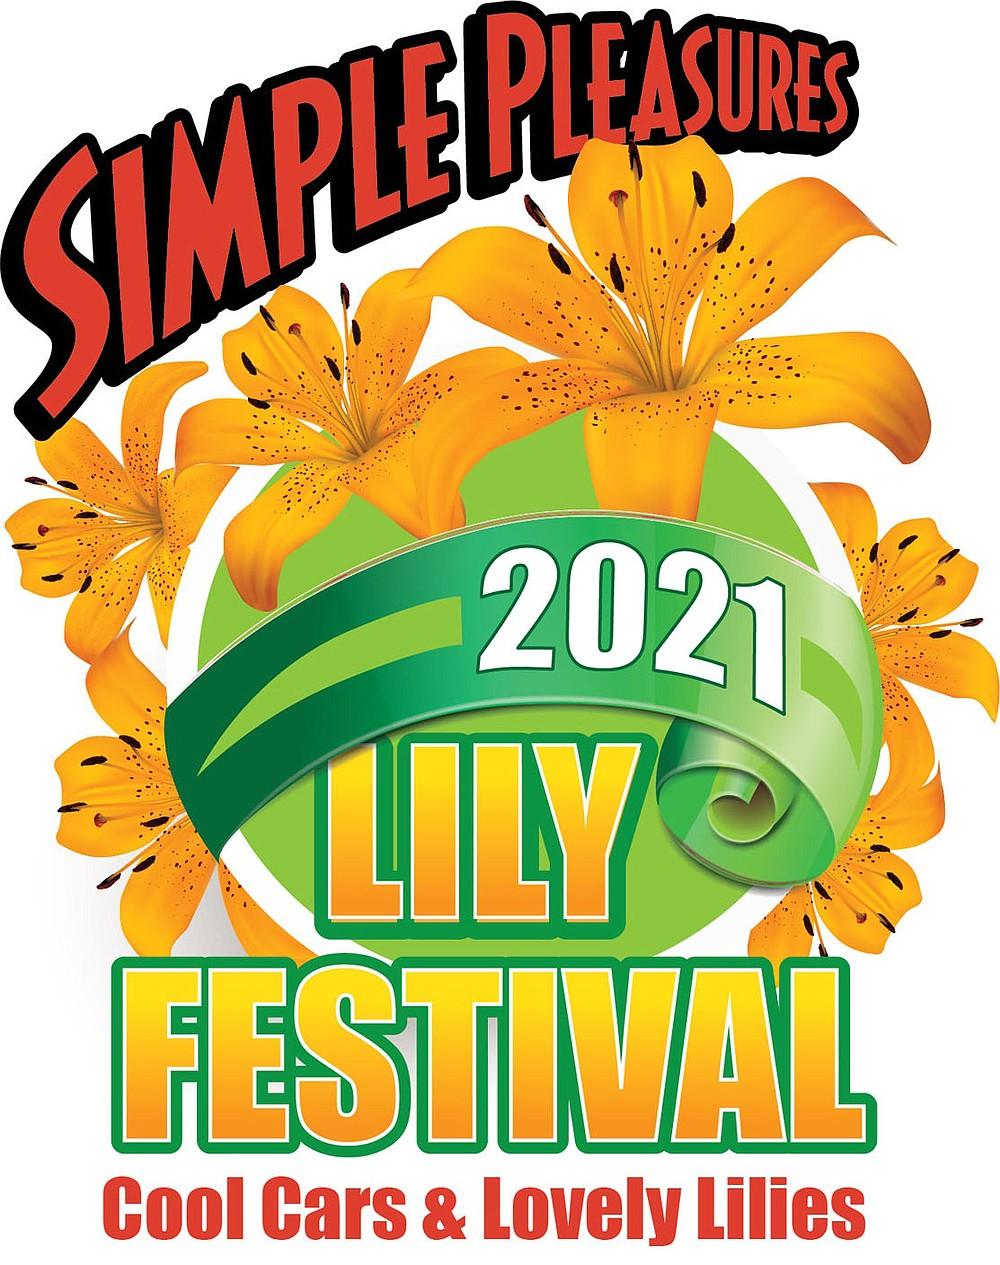 FAQ  Lily Festival  WHEN — 1-5 p.m. June 19-20  WHERE — Simple Pleasures Event Center, 13718 Rothbury Drive in Bella Vista  COST — Free  INFO — 876-5959 or simplepleasures.us